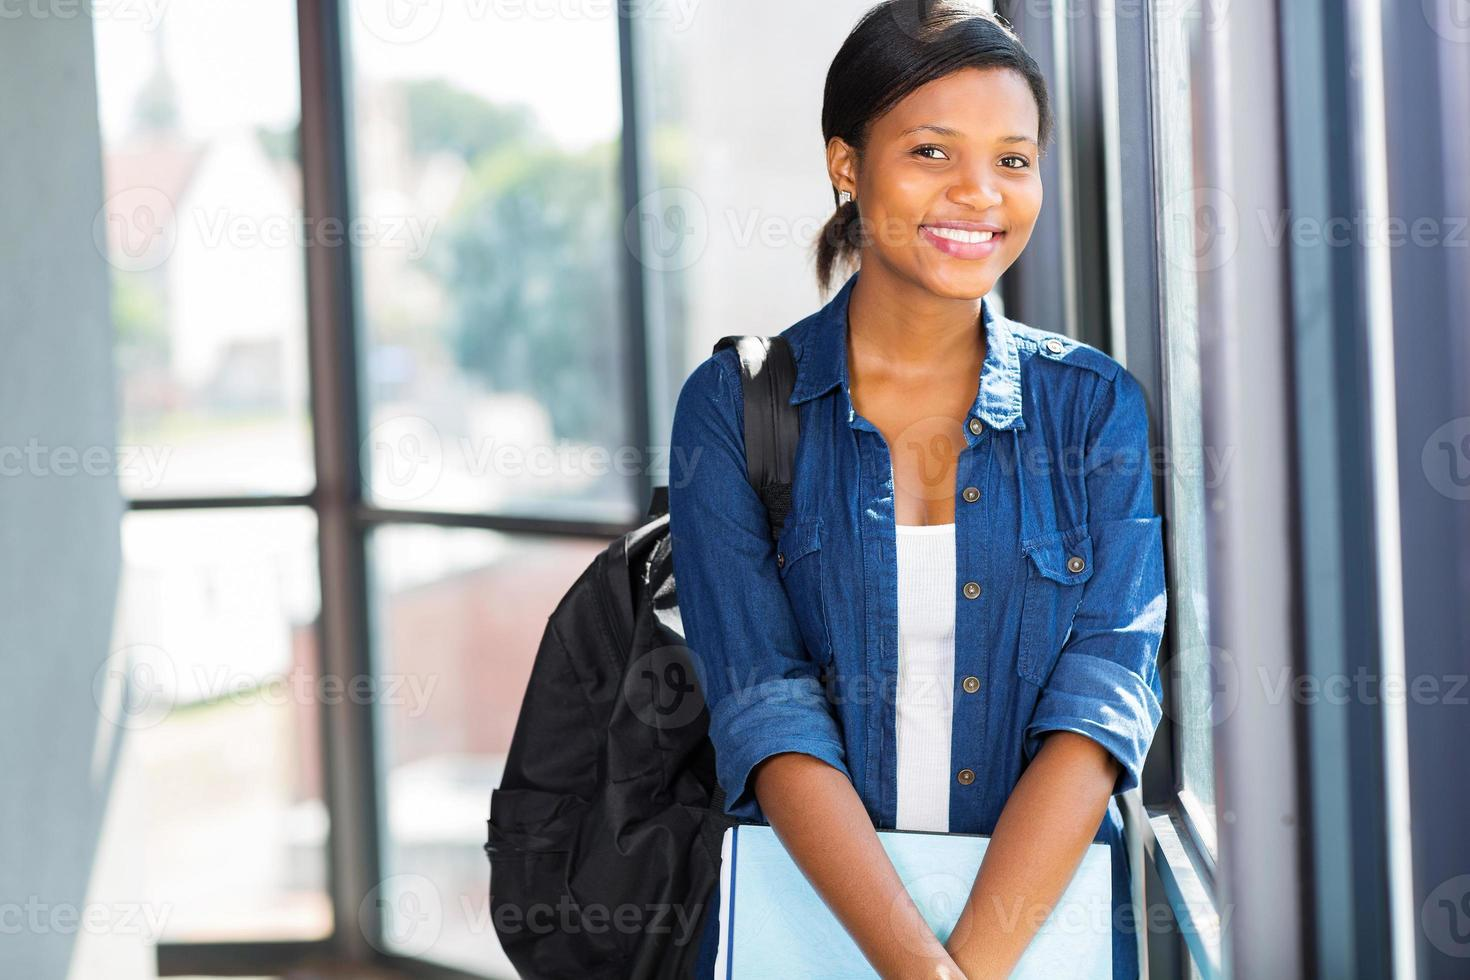 estudante universitário americano africano bonito foto